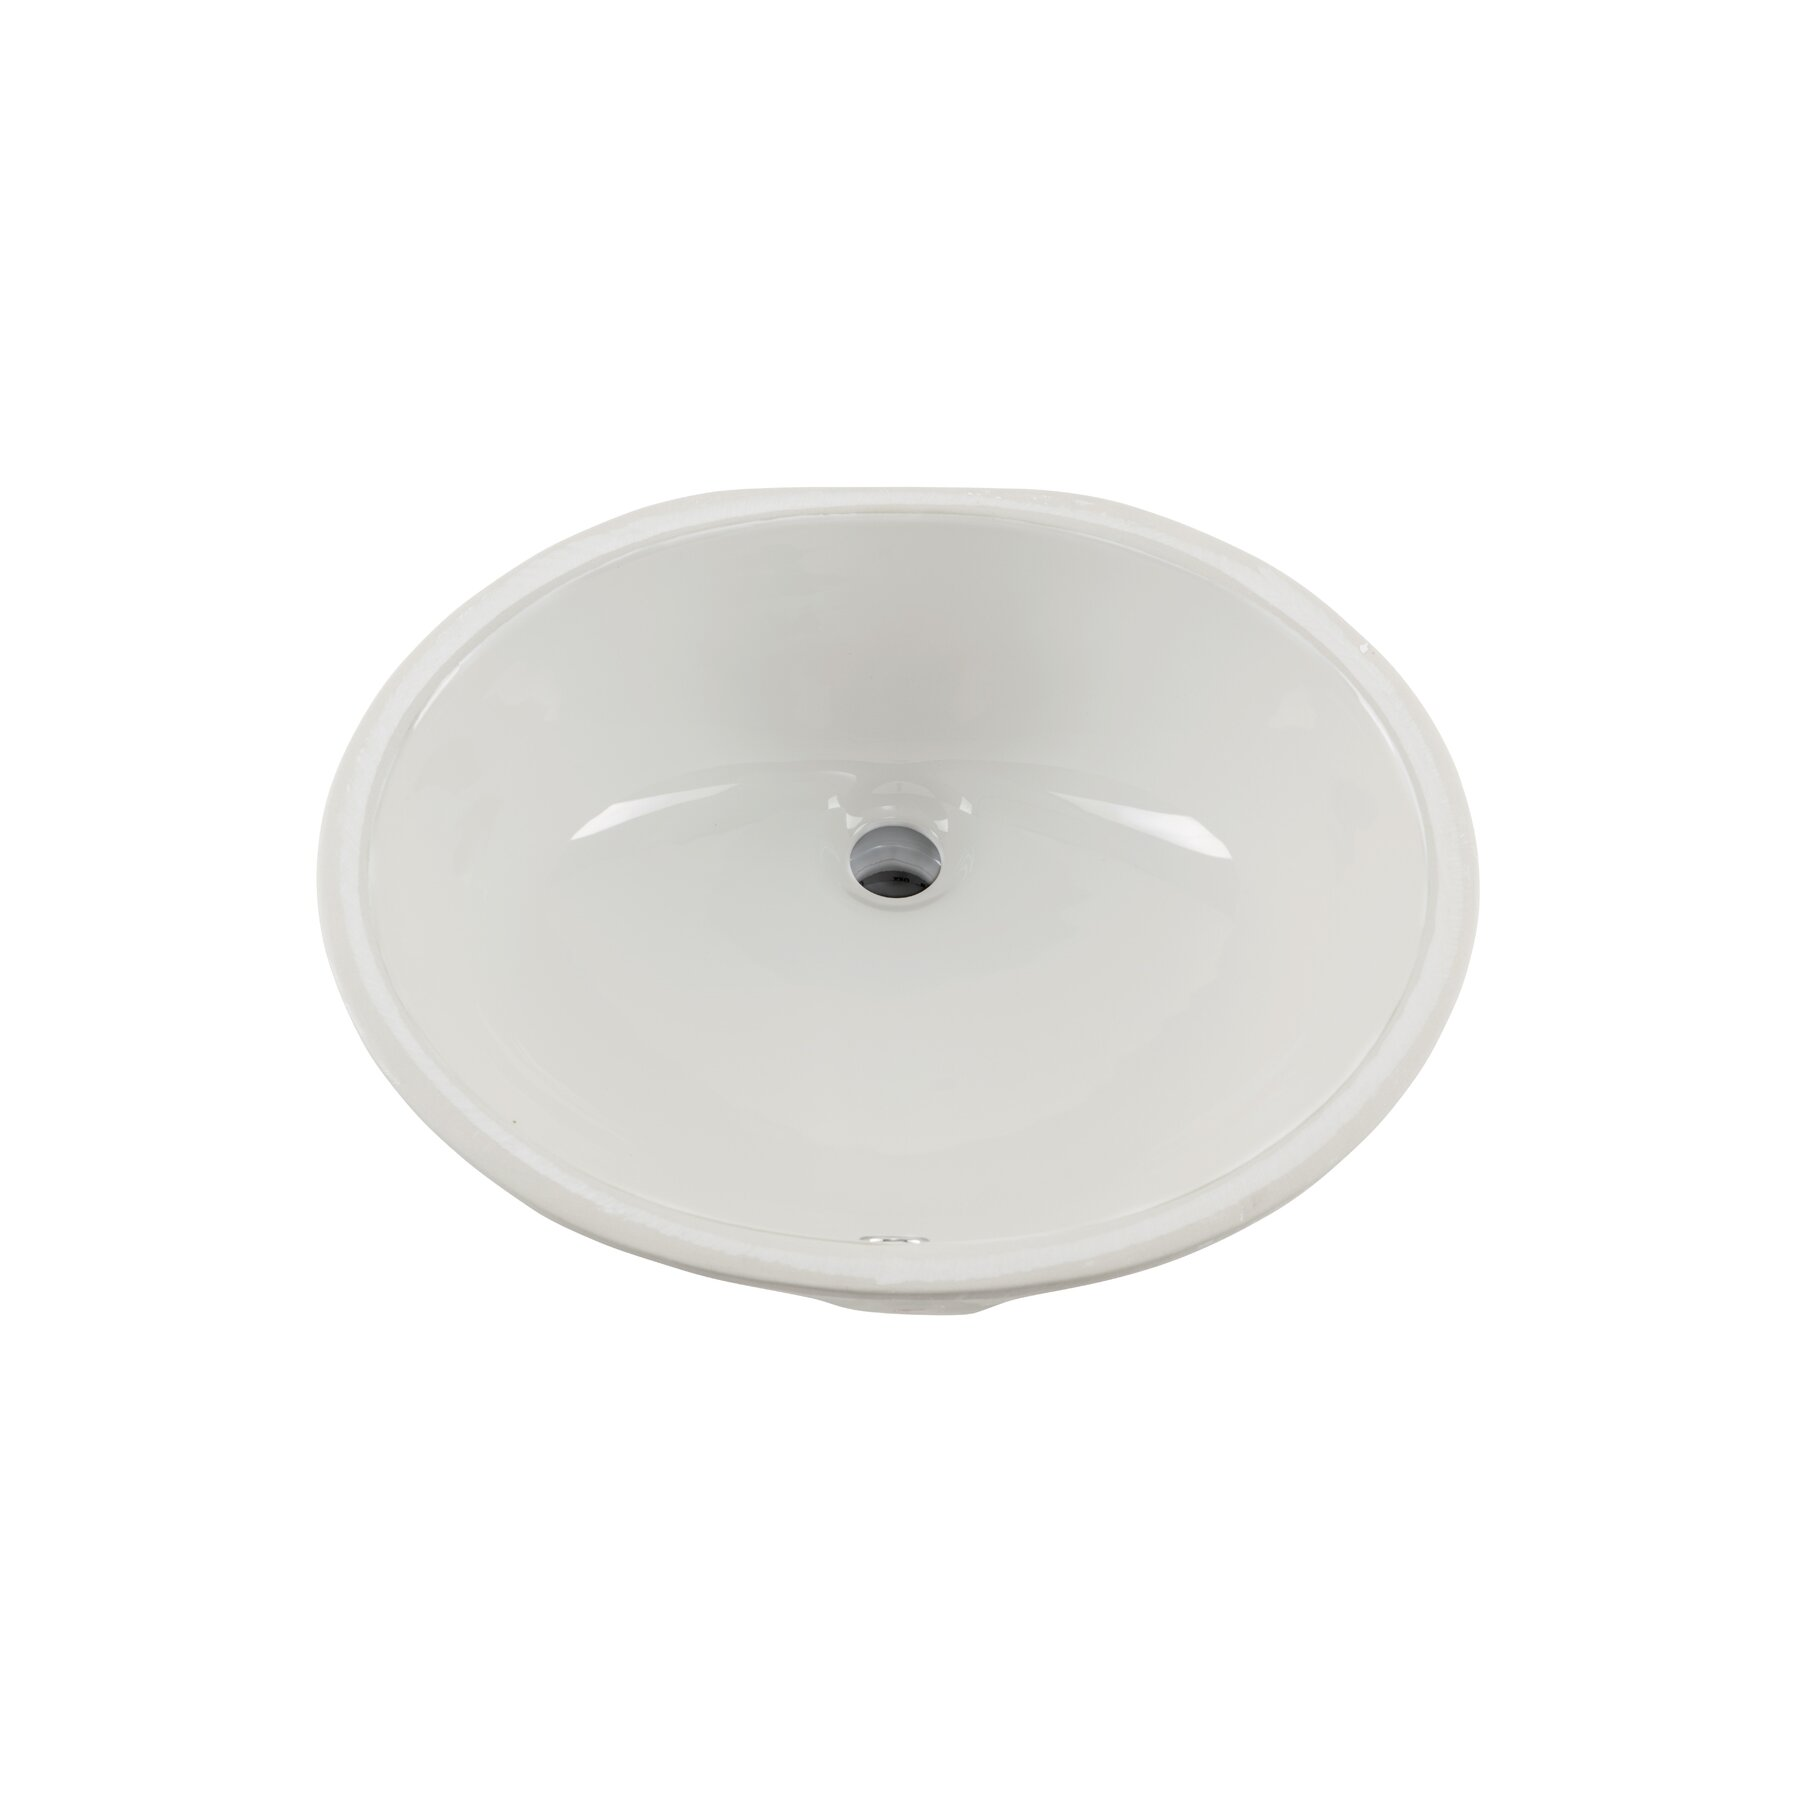 Soleil Glazed Porcelain Bathroom Undermount Sink Reviews Wayfair